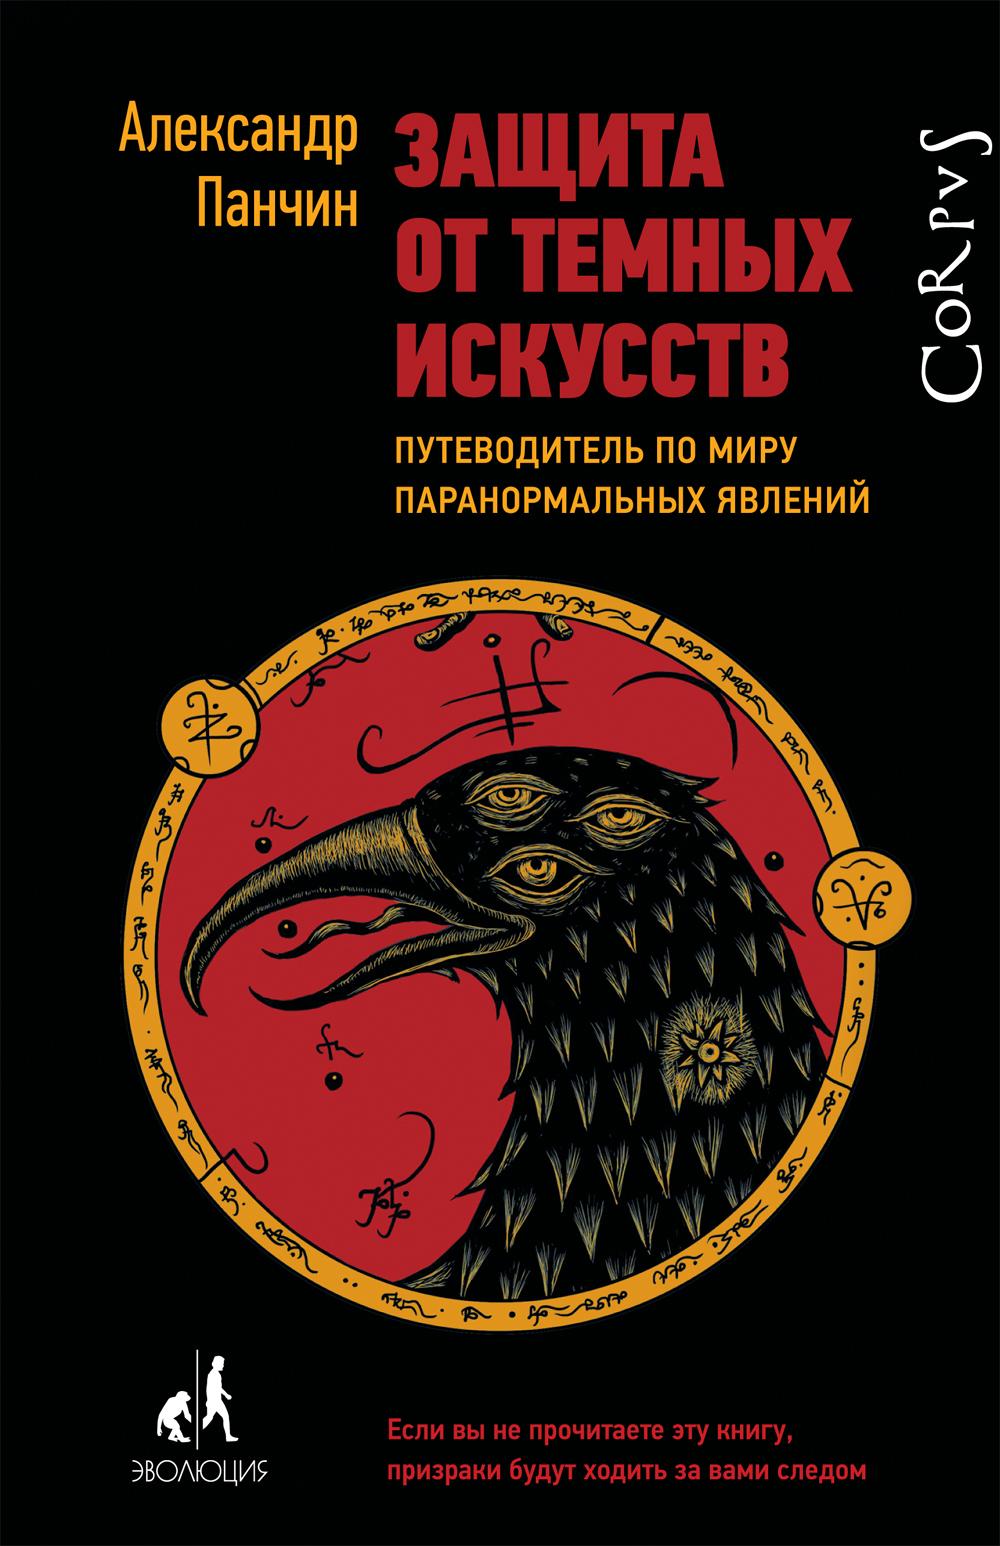 Александр Панчин. Защита от темных искусств